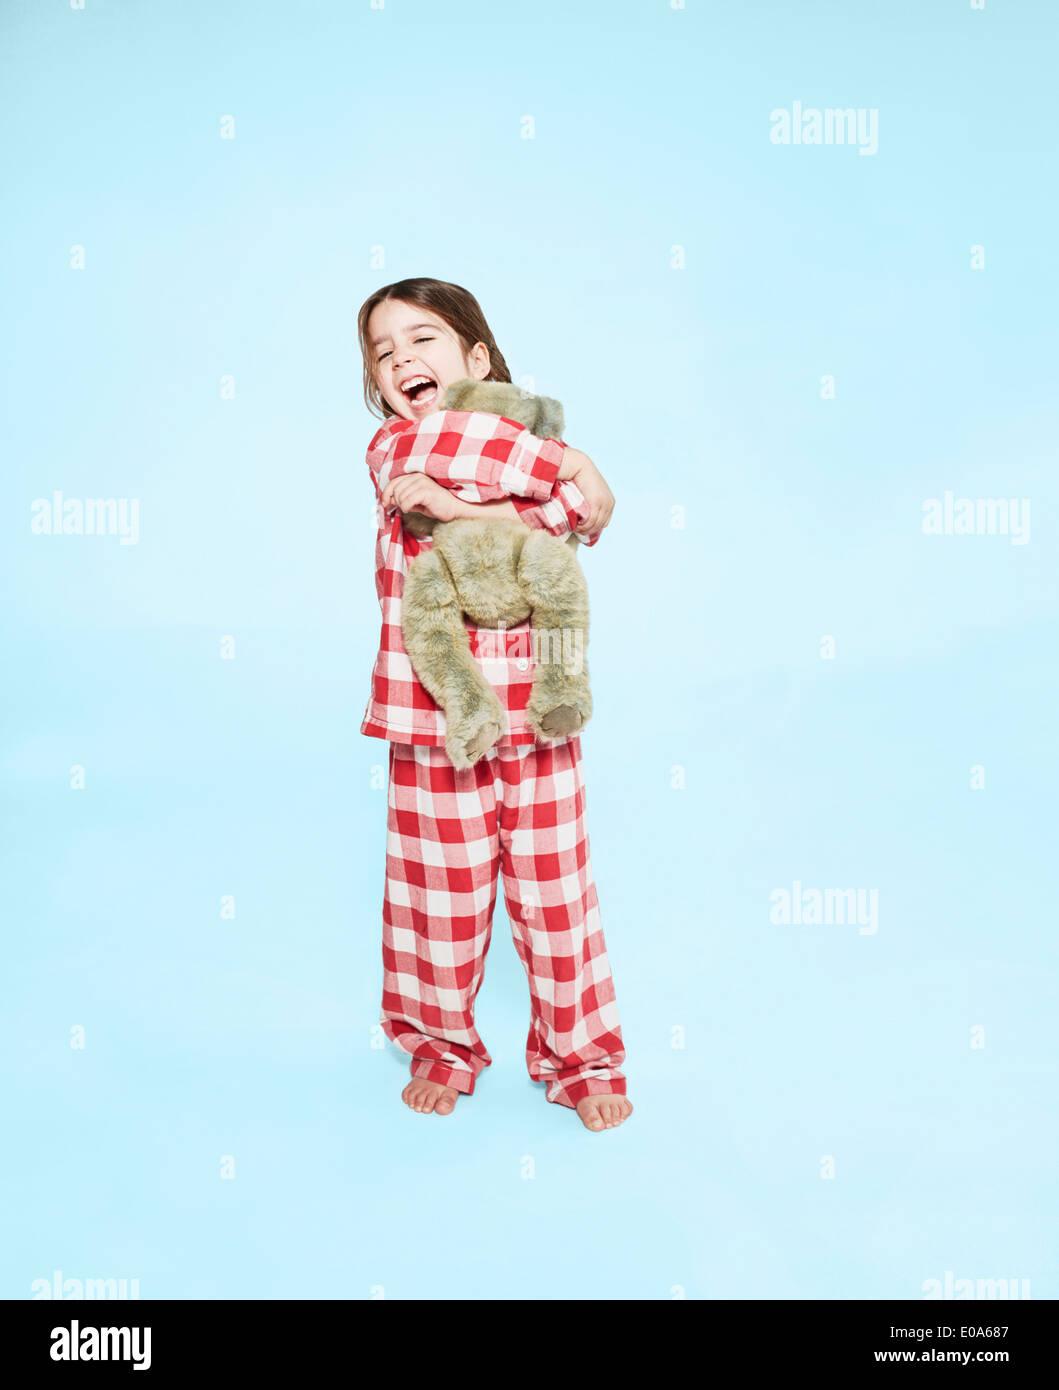 Girl hugging teddy bear - Stock Image